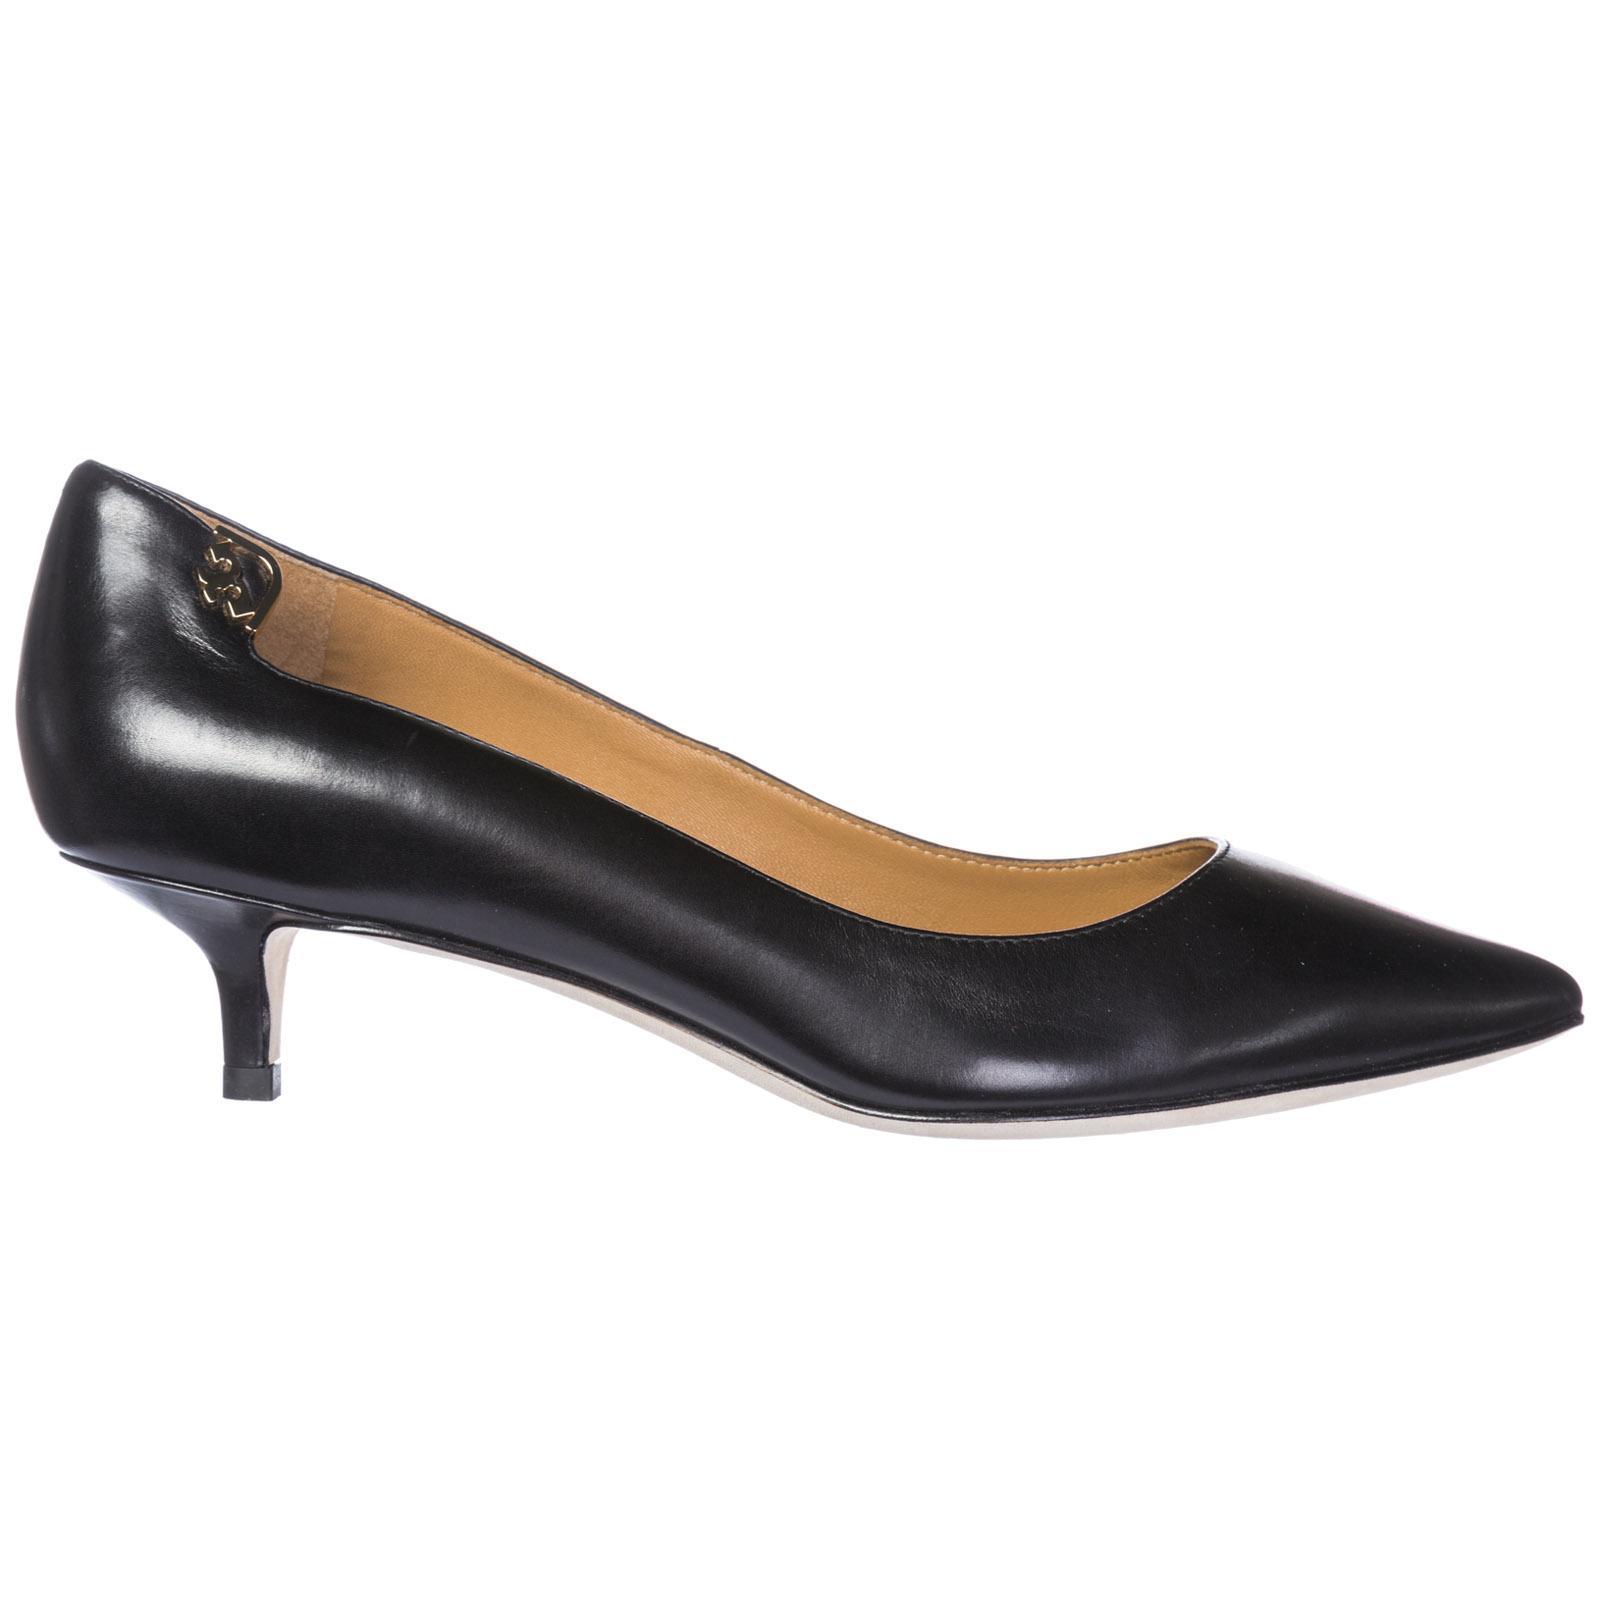 dd545d8c6255 Tory Burch Women s Leather Pumps Court Shoes High Heel Elizabeth In Black